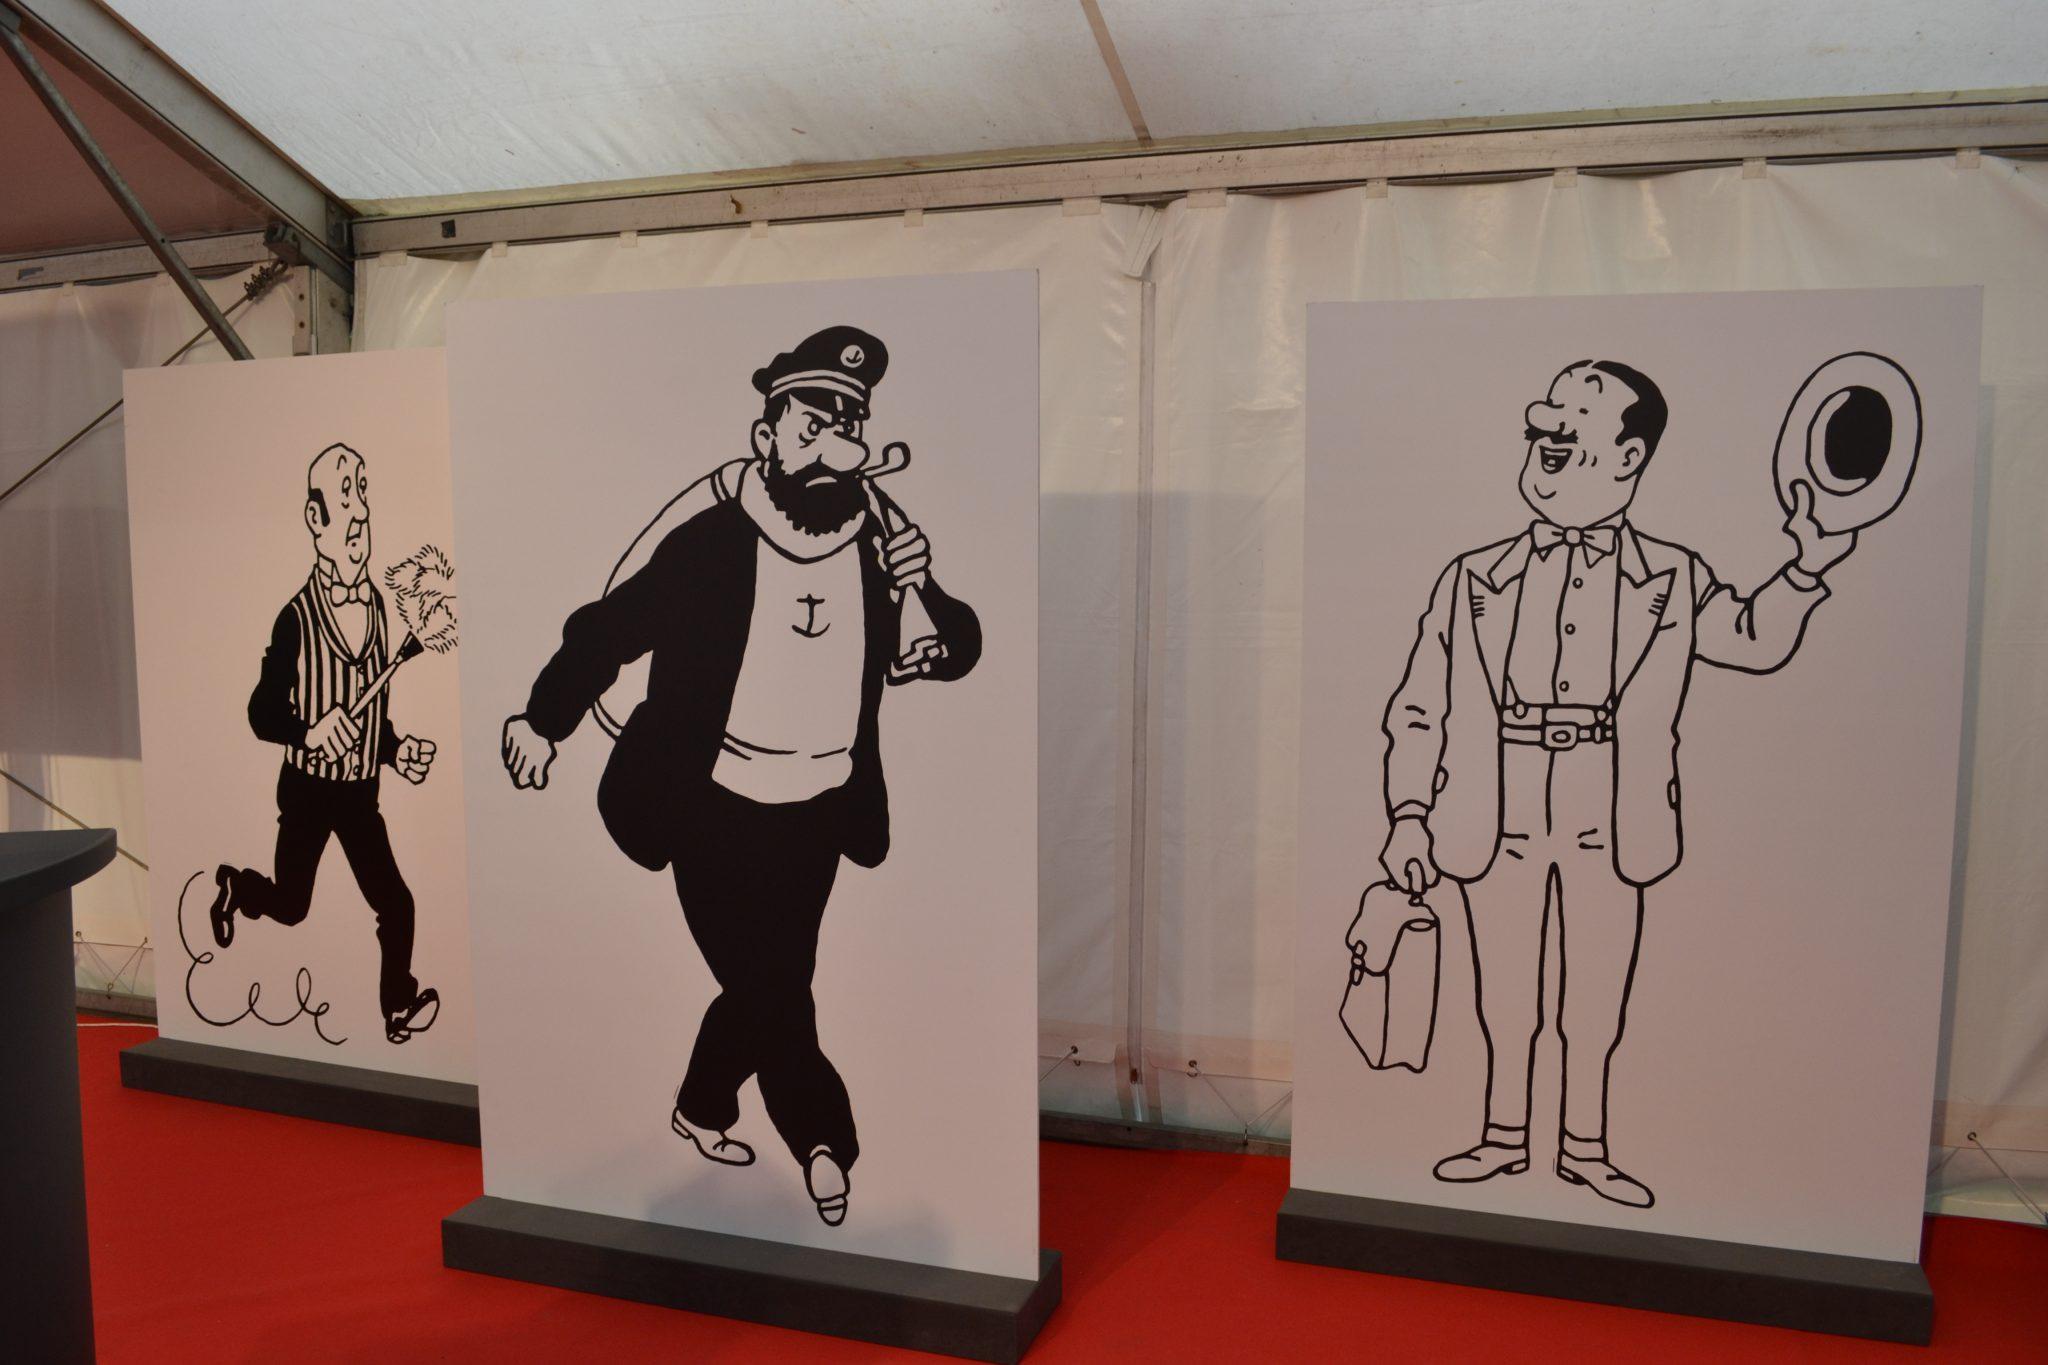 Comicfestival Brüssel - dsc 0022